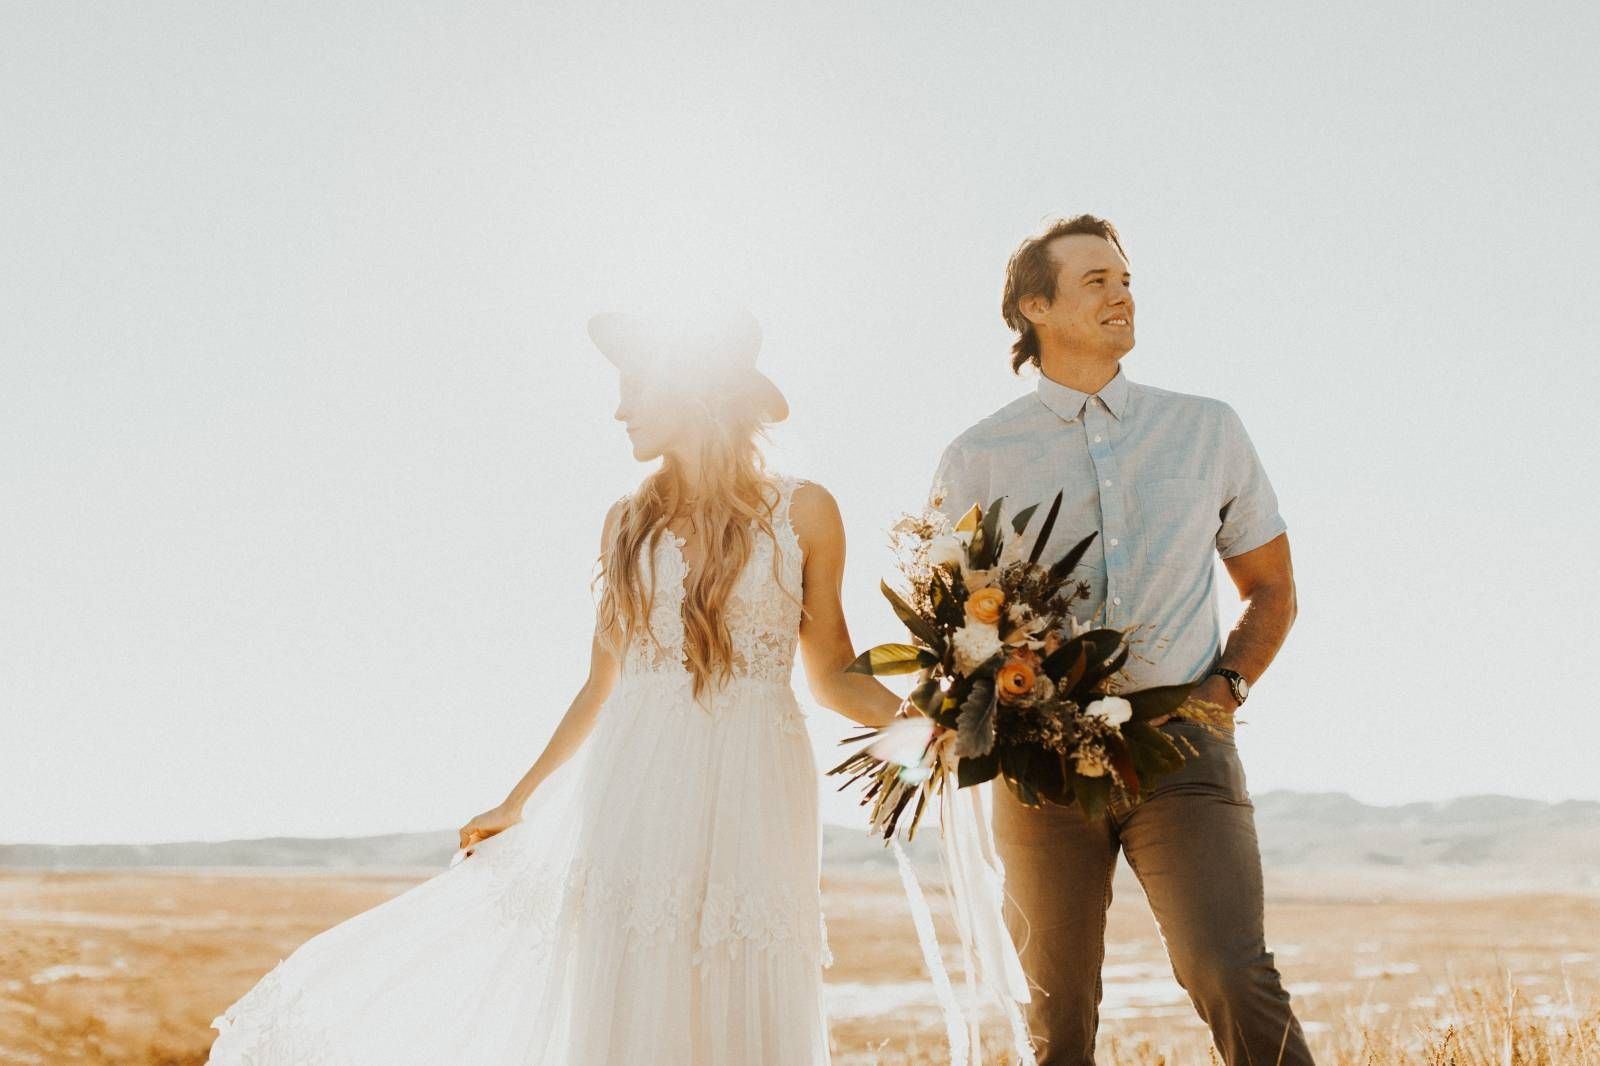 Glowing fort collins wedding inspiration wedding